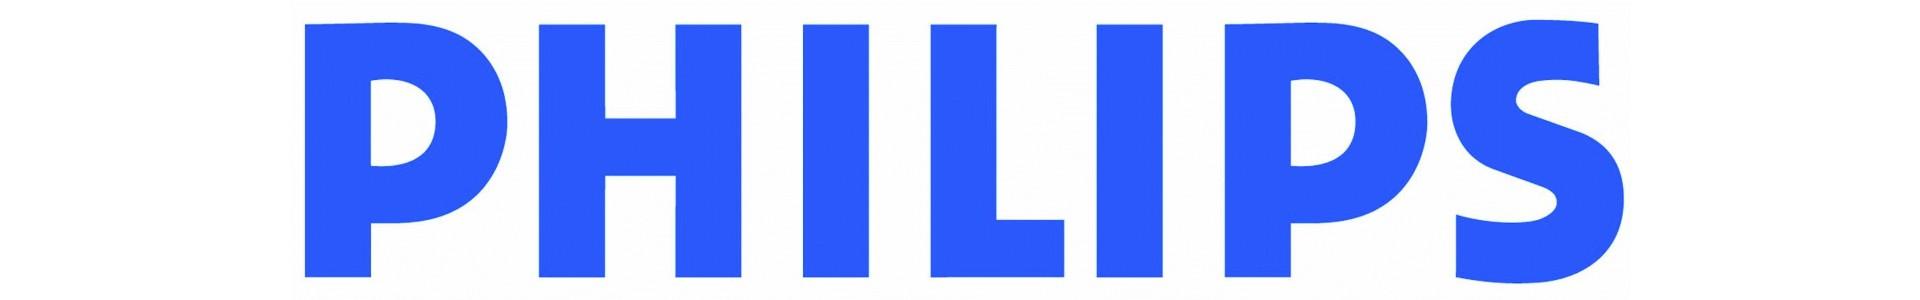 Tinteiros Compativeis Philips